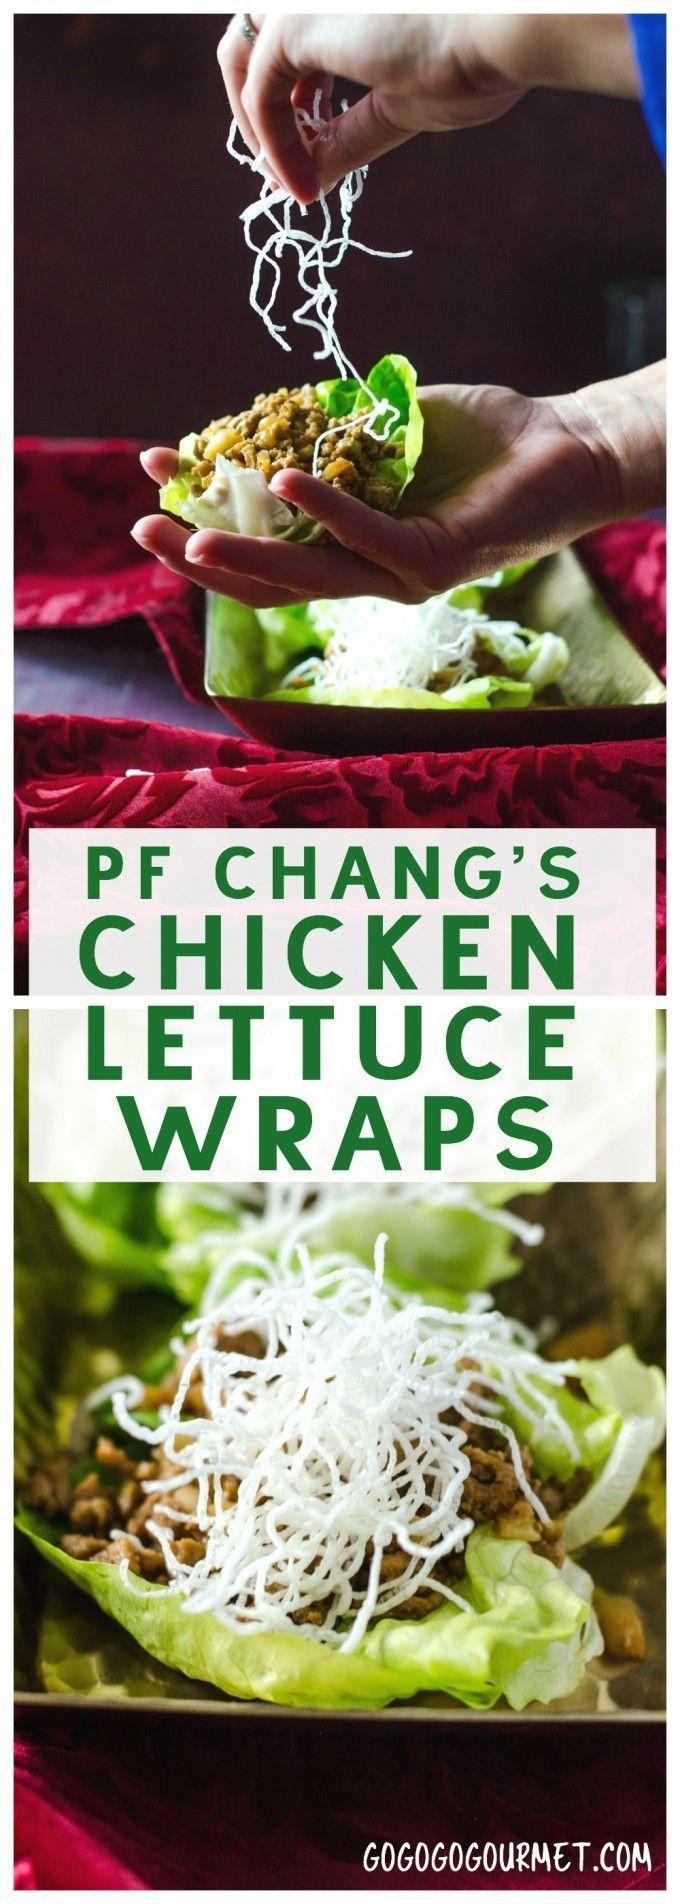 Chicken Lettuce Wraps (PF Chang's Copycat) via @gogogogourmet